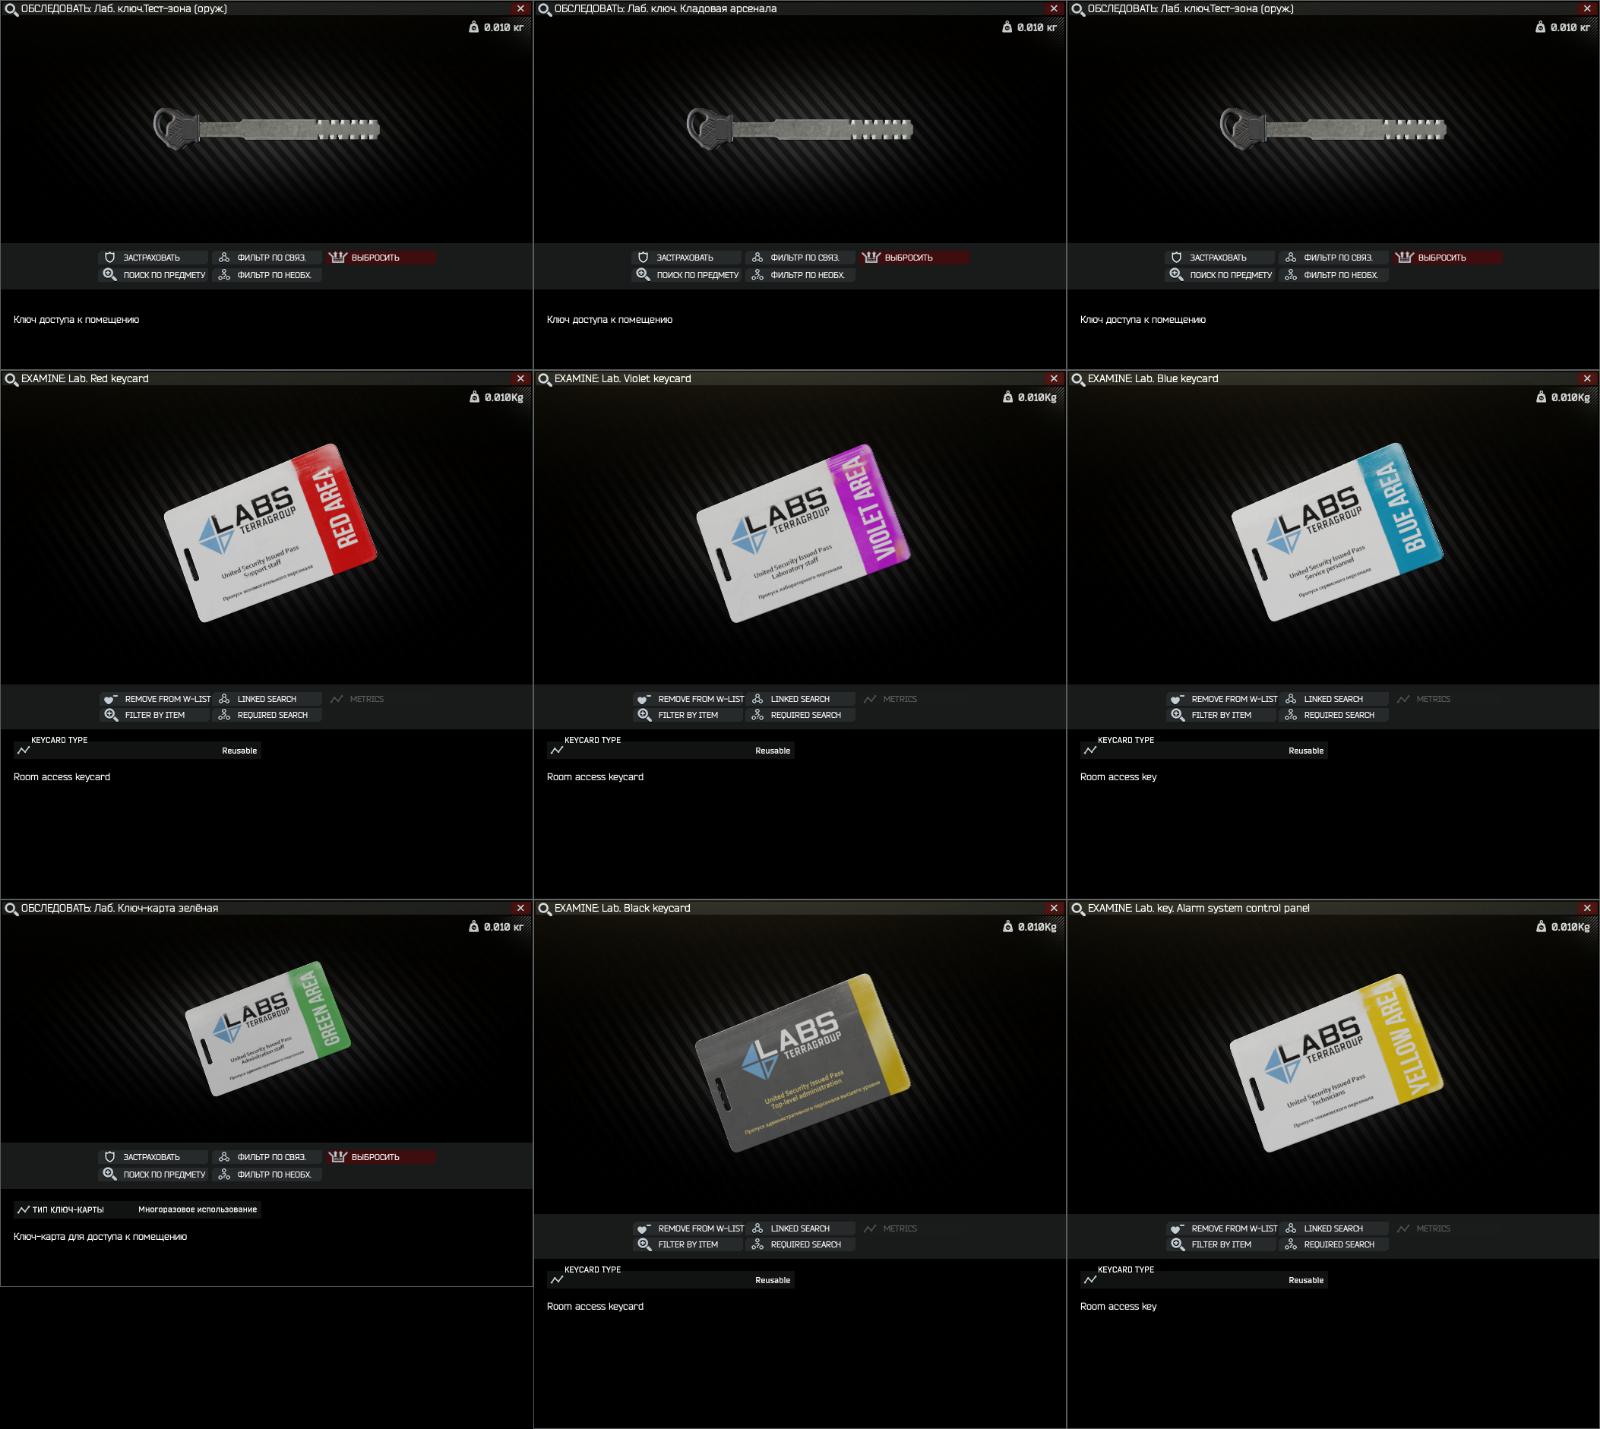 Lab. full keys set Red, Blue, Black, Yellow, Green, Violet + 7 Access cards + 3 keys